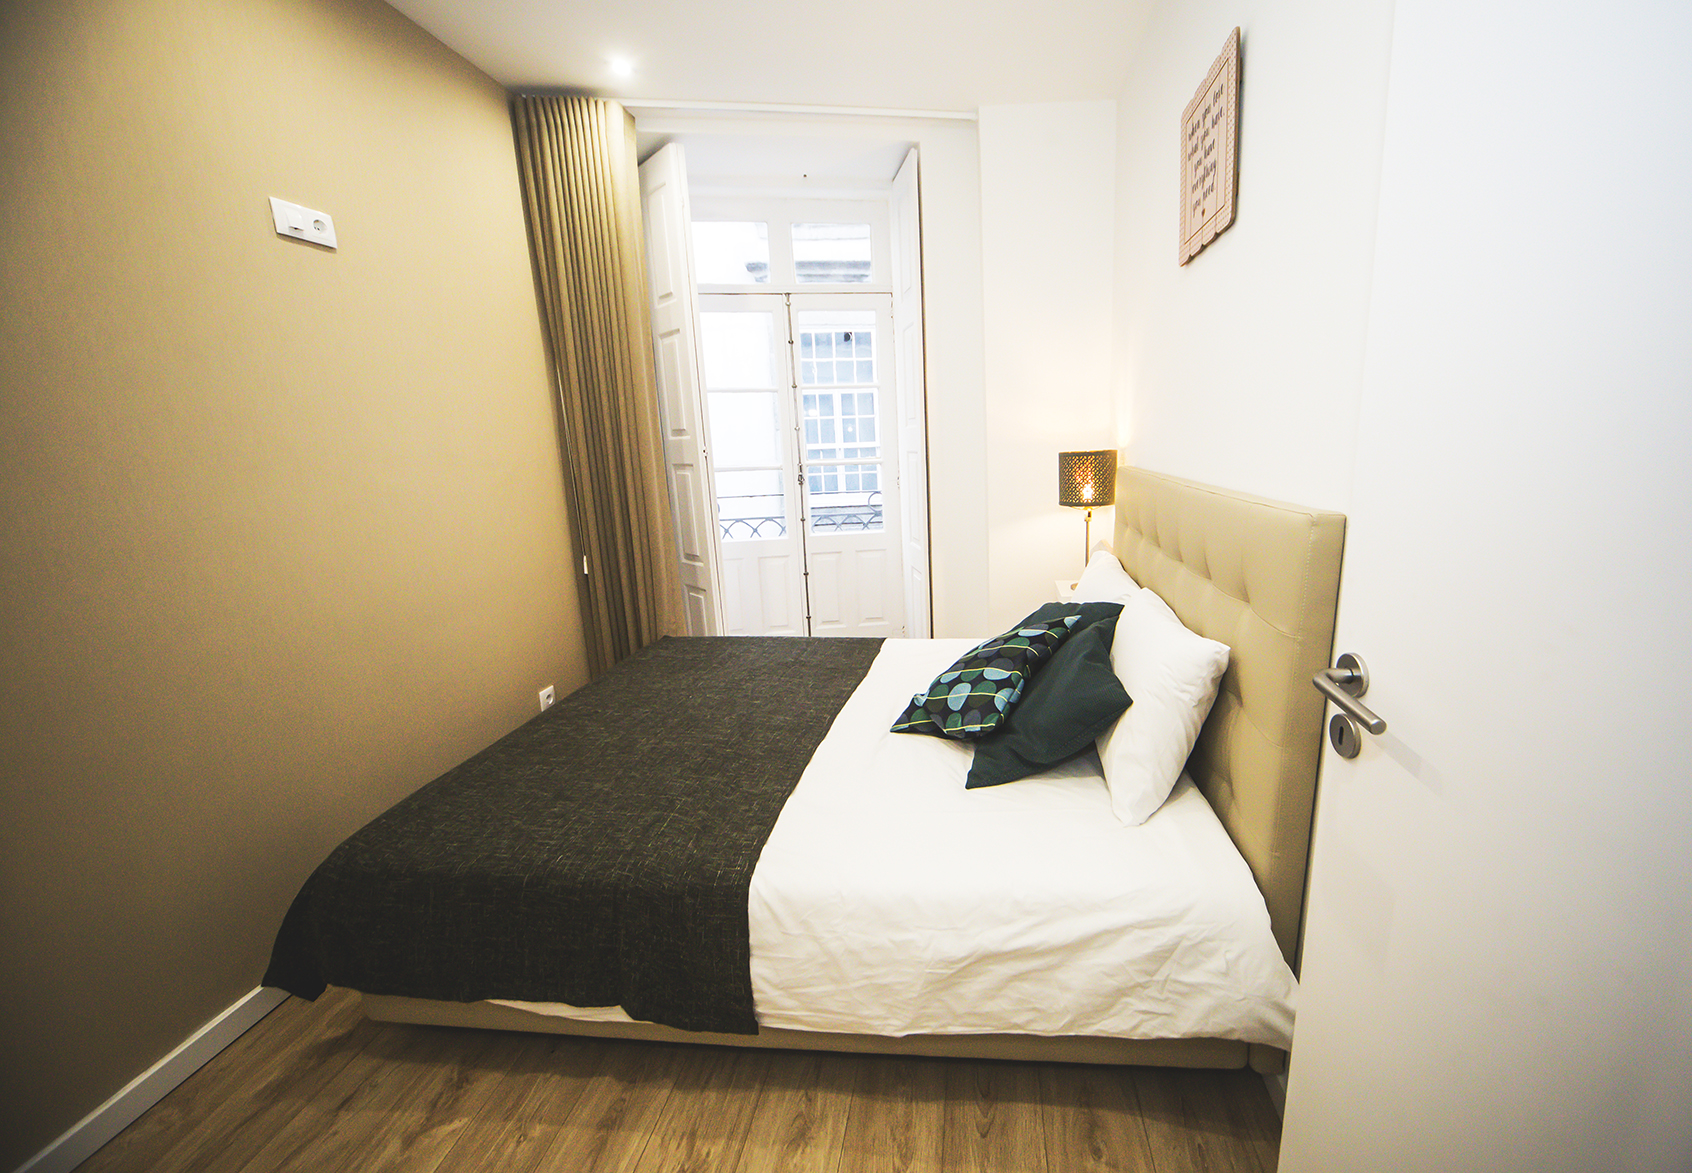 2 apartamentos oporto centro para 4 personas